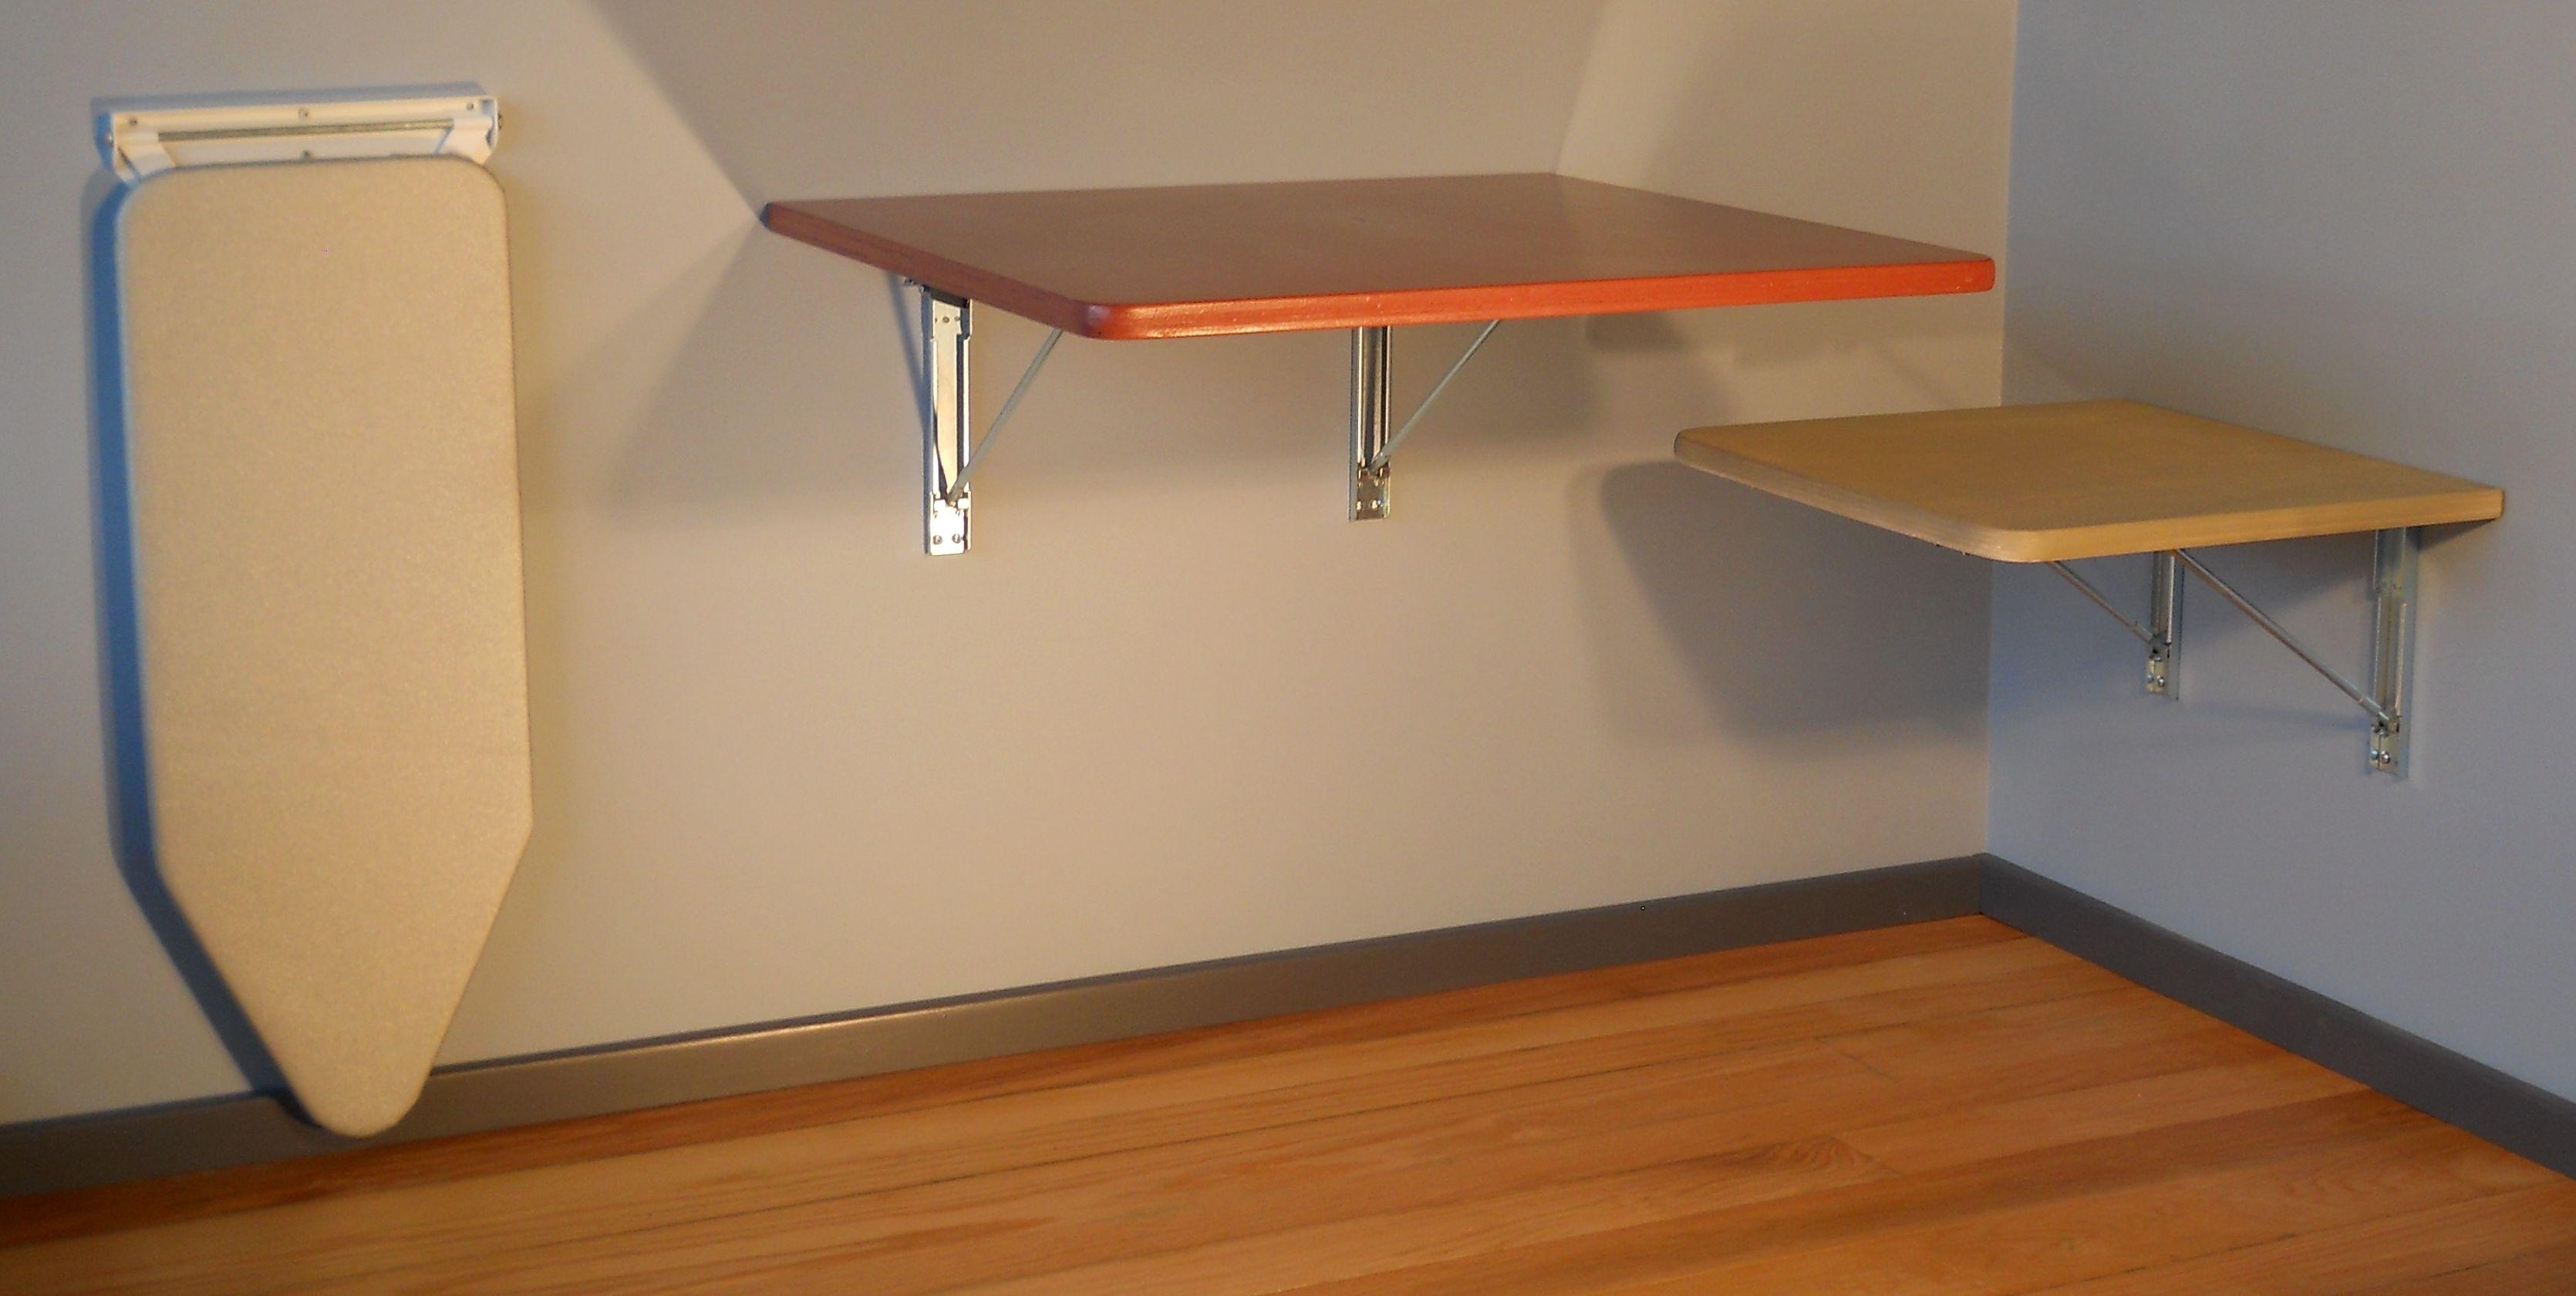 Charmant Fold Down Wall Table Brackets